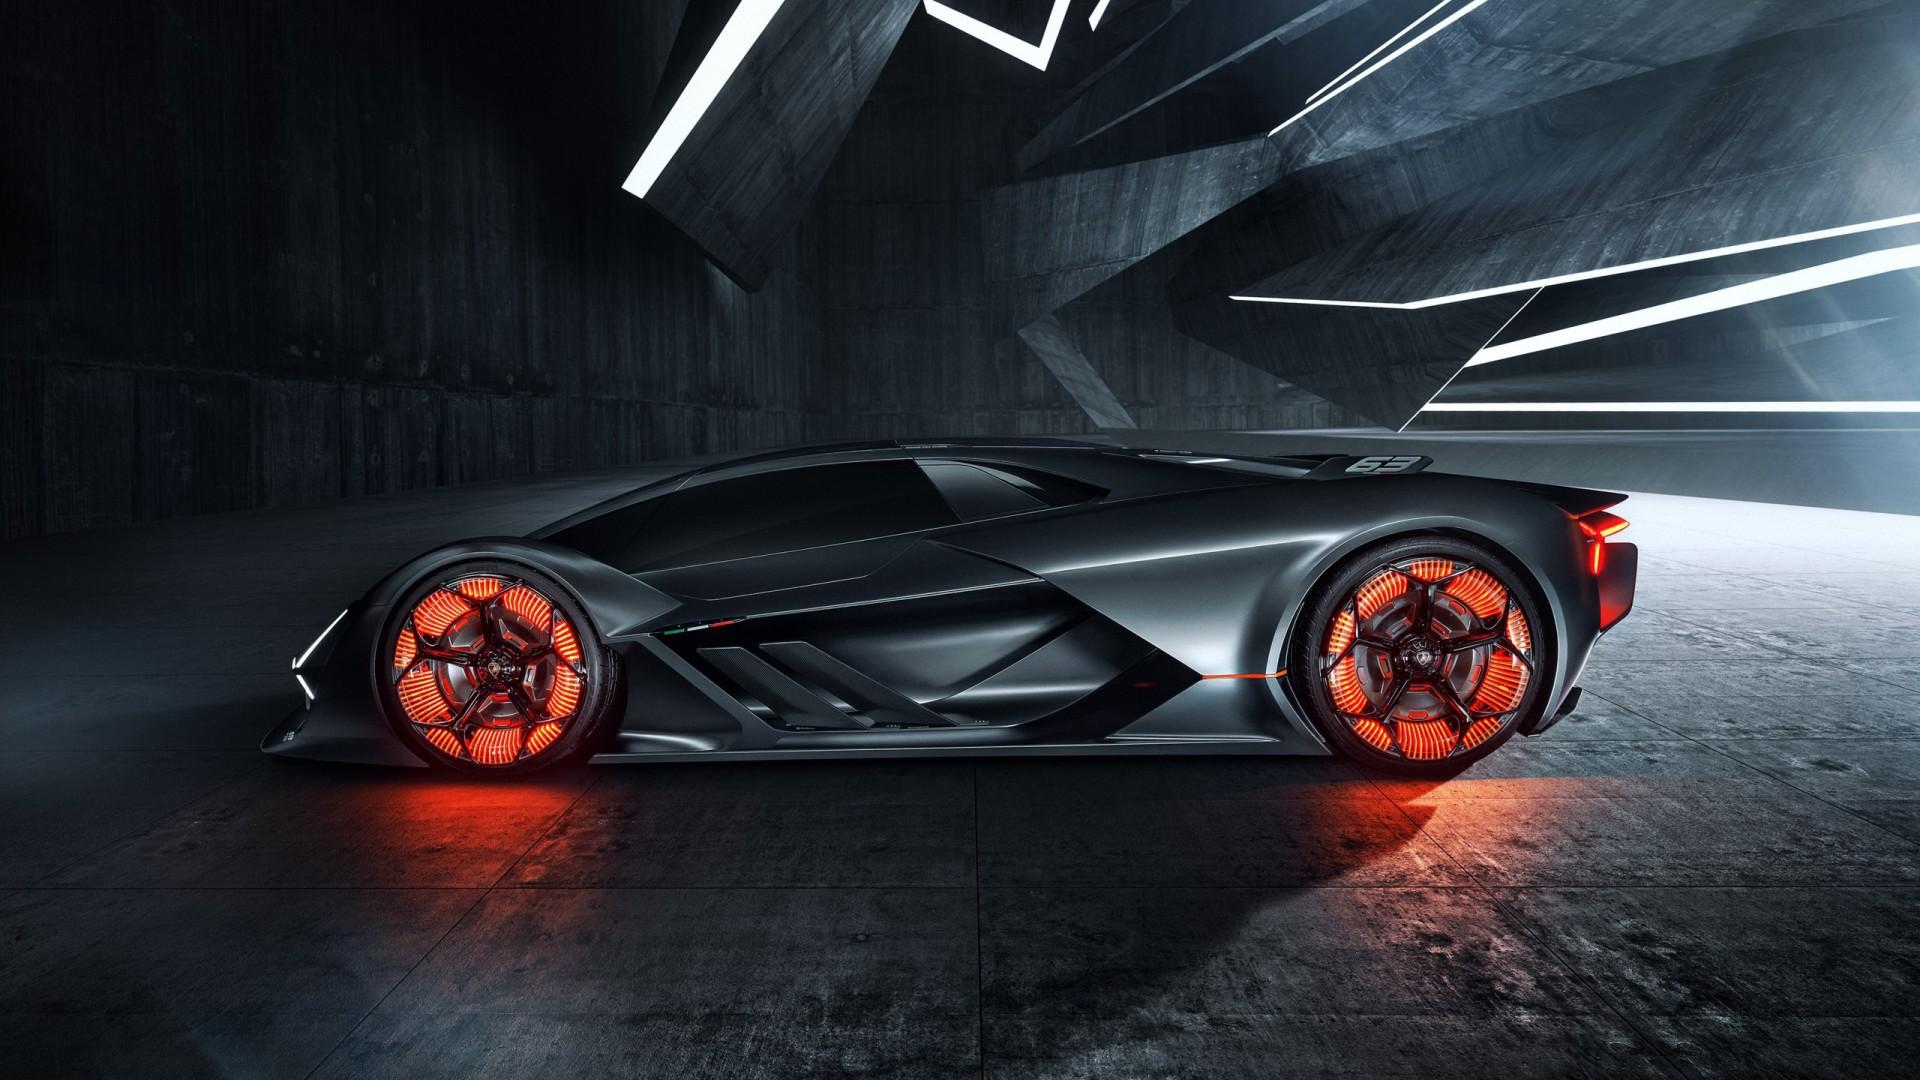 Lamborghini Terzo Millennio 2019 3 Wallpaper | HD Car Wallpapers | ID #11699